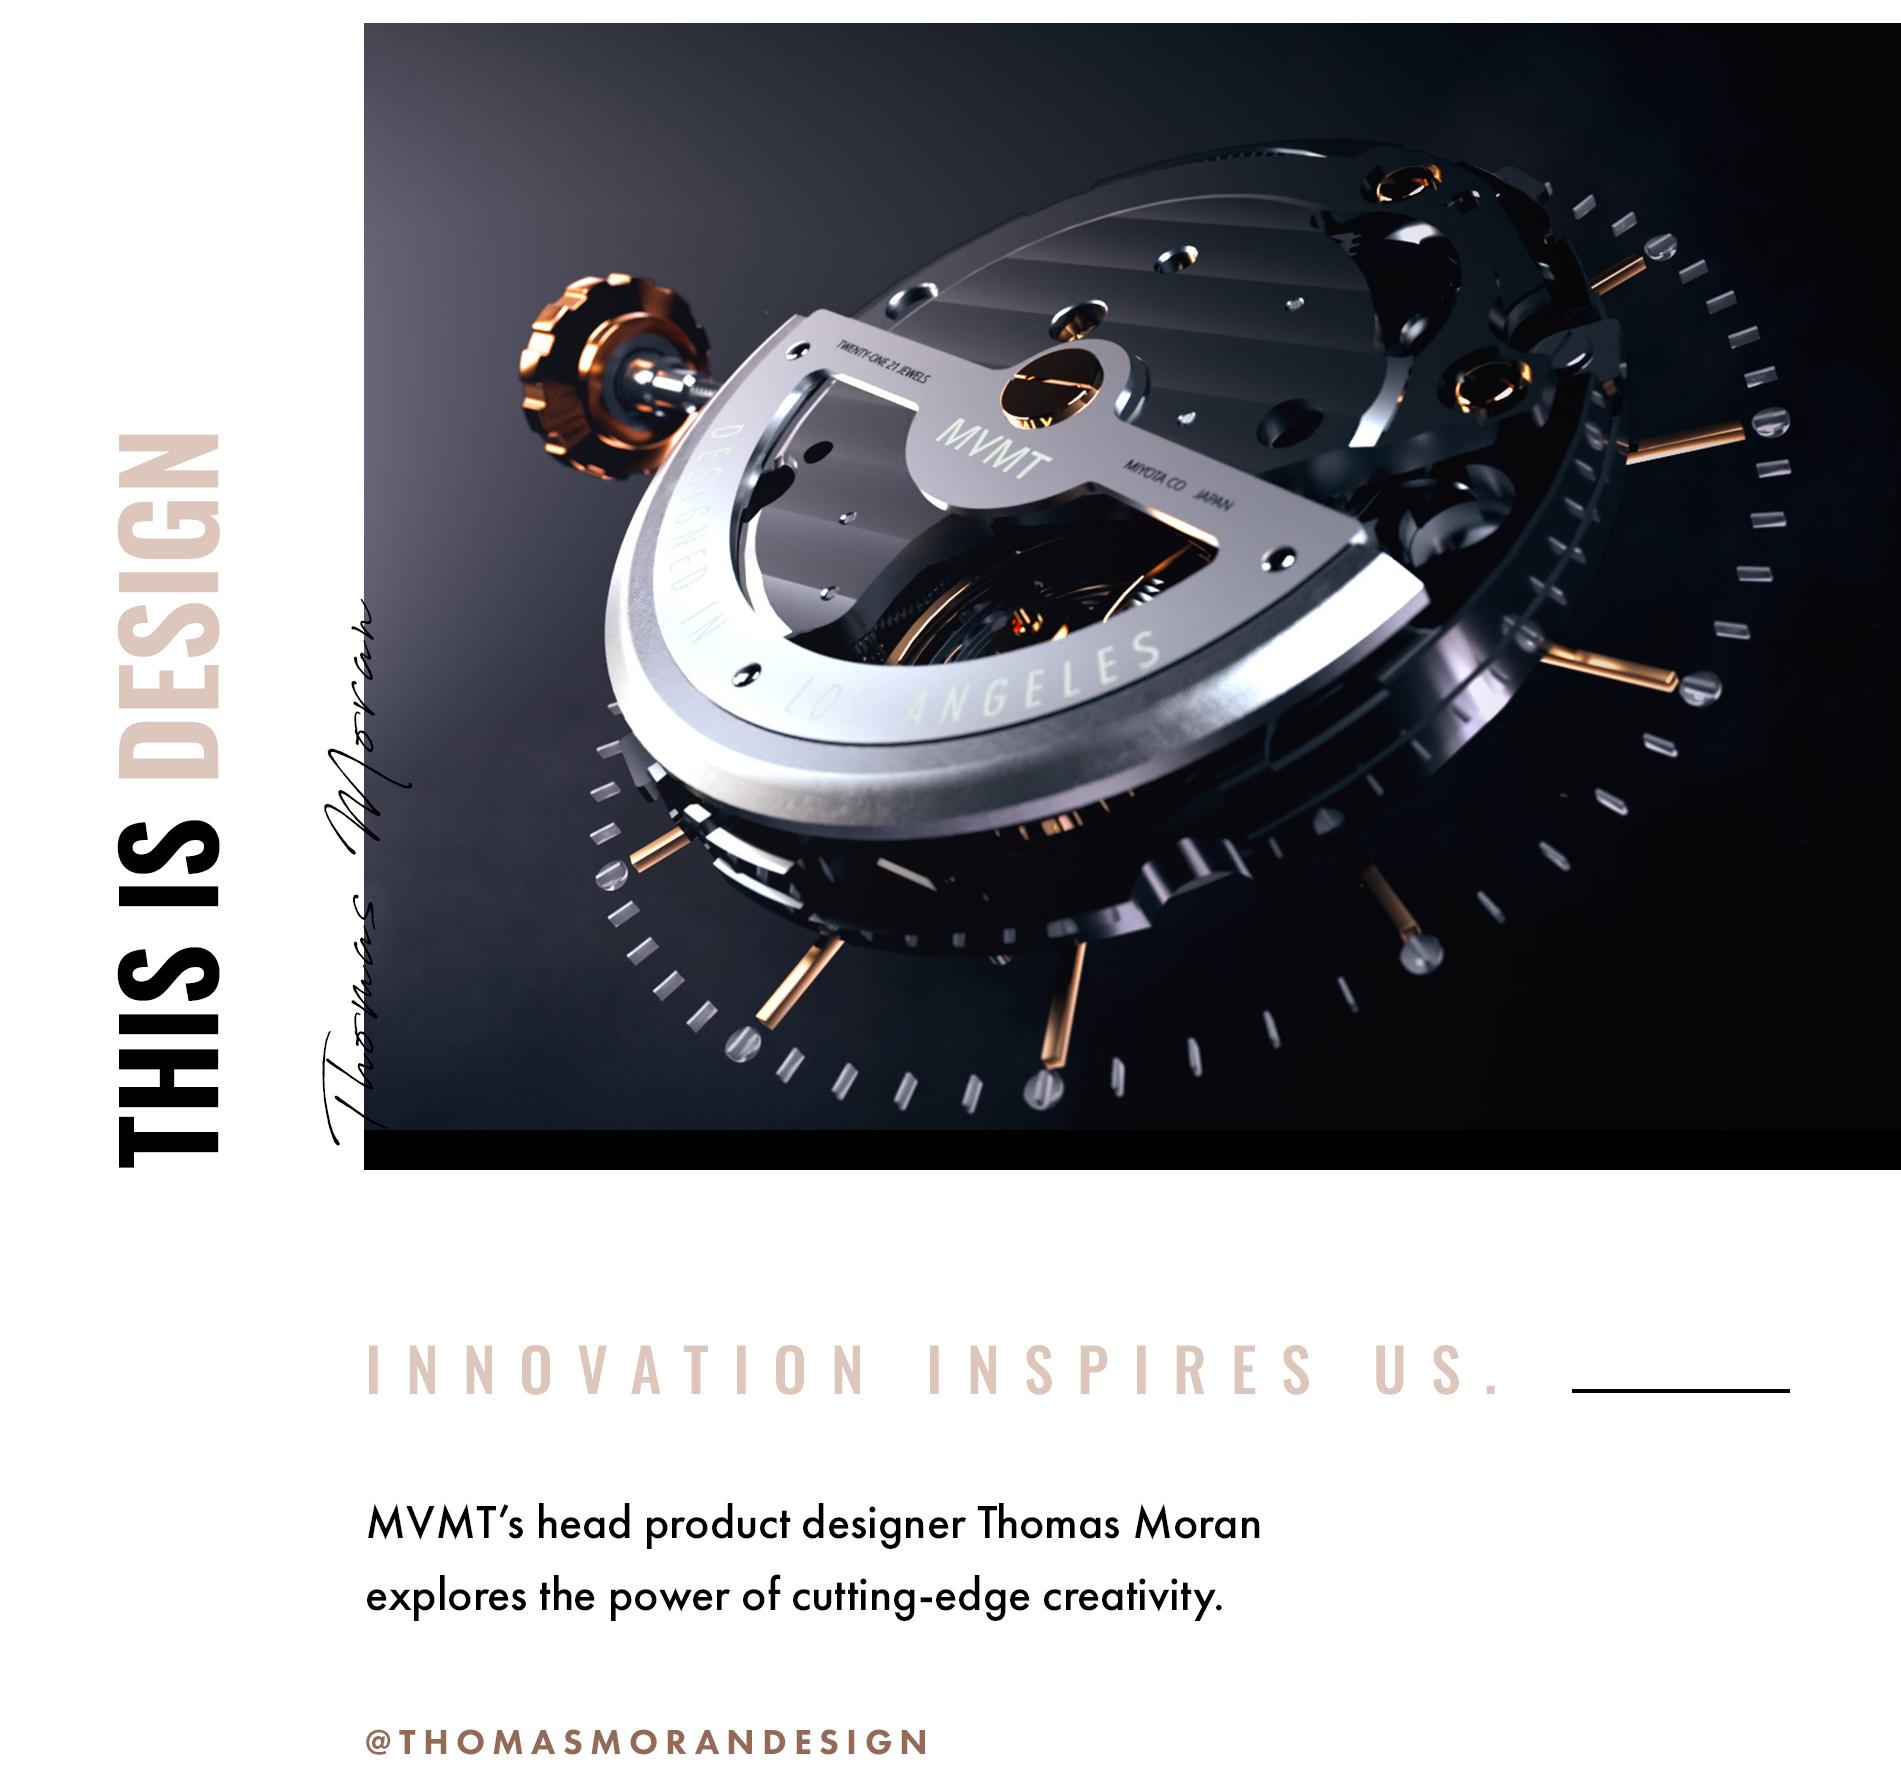 This is design. Thomas Moran. Innovation inspires us. MVMT's head product designer Thomas Moran explores the power of cutting-edge creativity. @thomasmorandesign